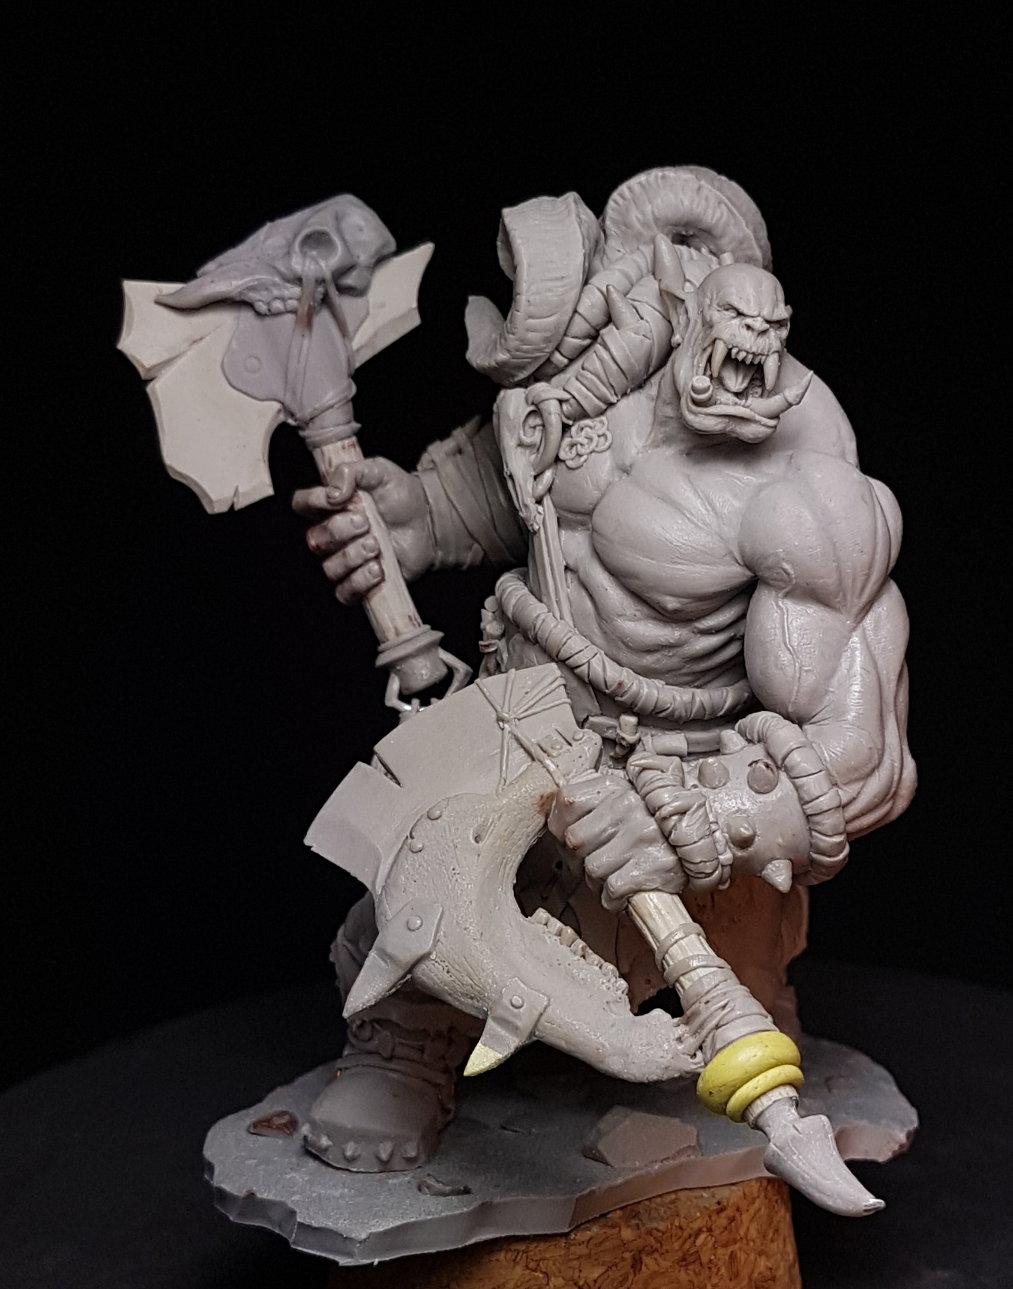 1//24 75 mm Resin Figure Kit Model Warrior Barbarian Unpainted Unassembled